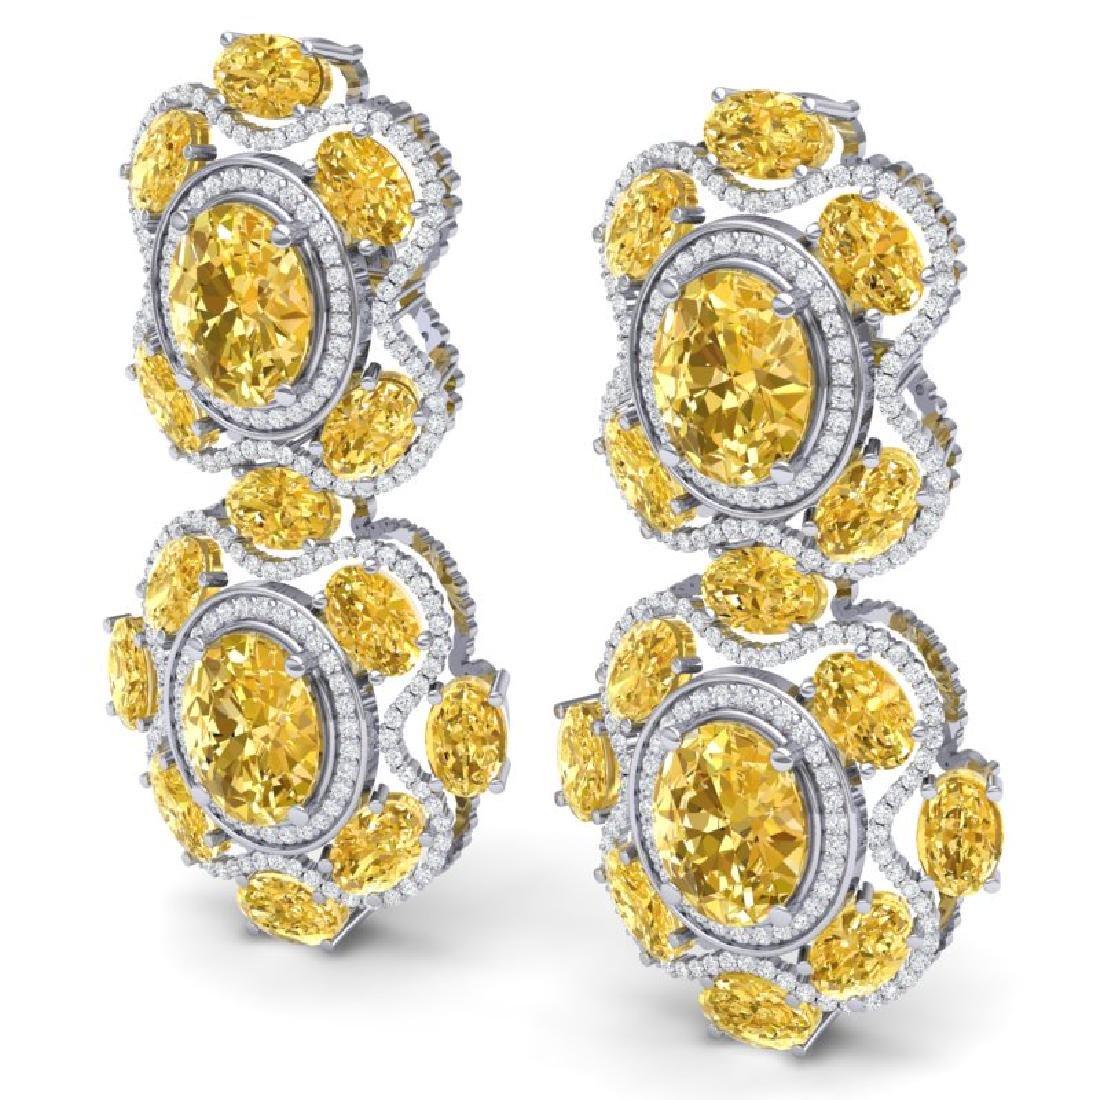 29.21 CTW Royalty Canary Citrine & VS Diamond Earrings - 2